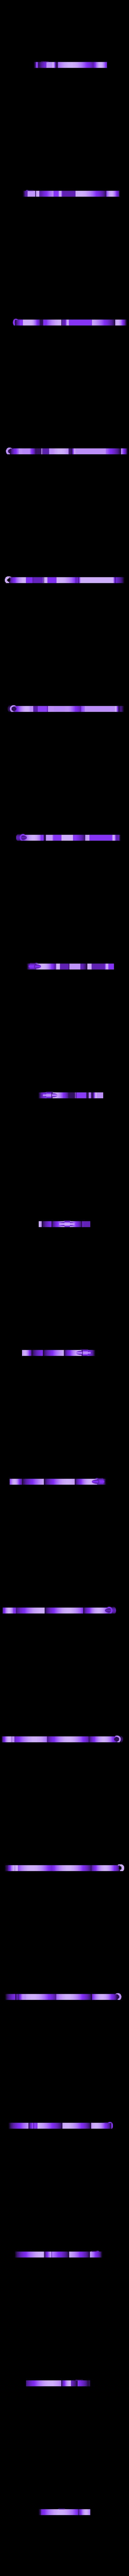 3rdesignkeychain2.stl Download free STL file Stripe Gremlin • 3D printer model, 3rdesignworks